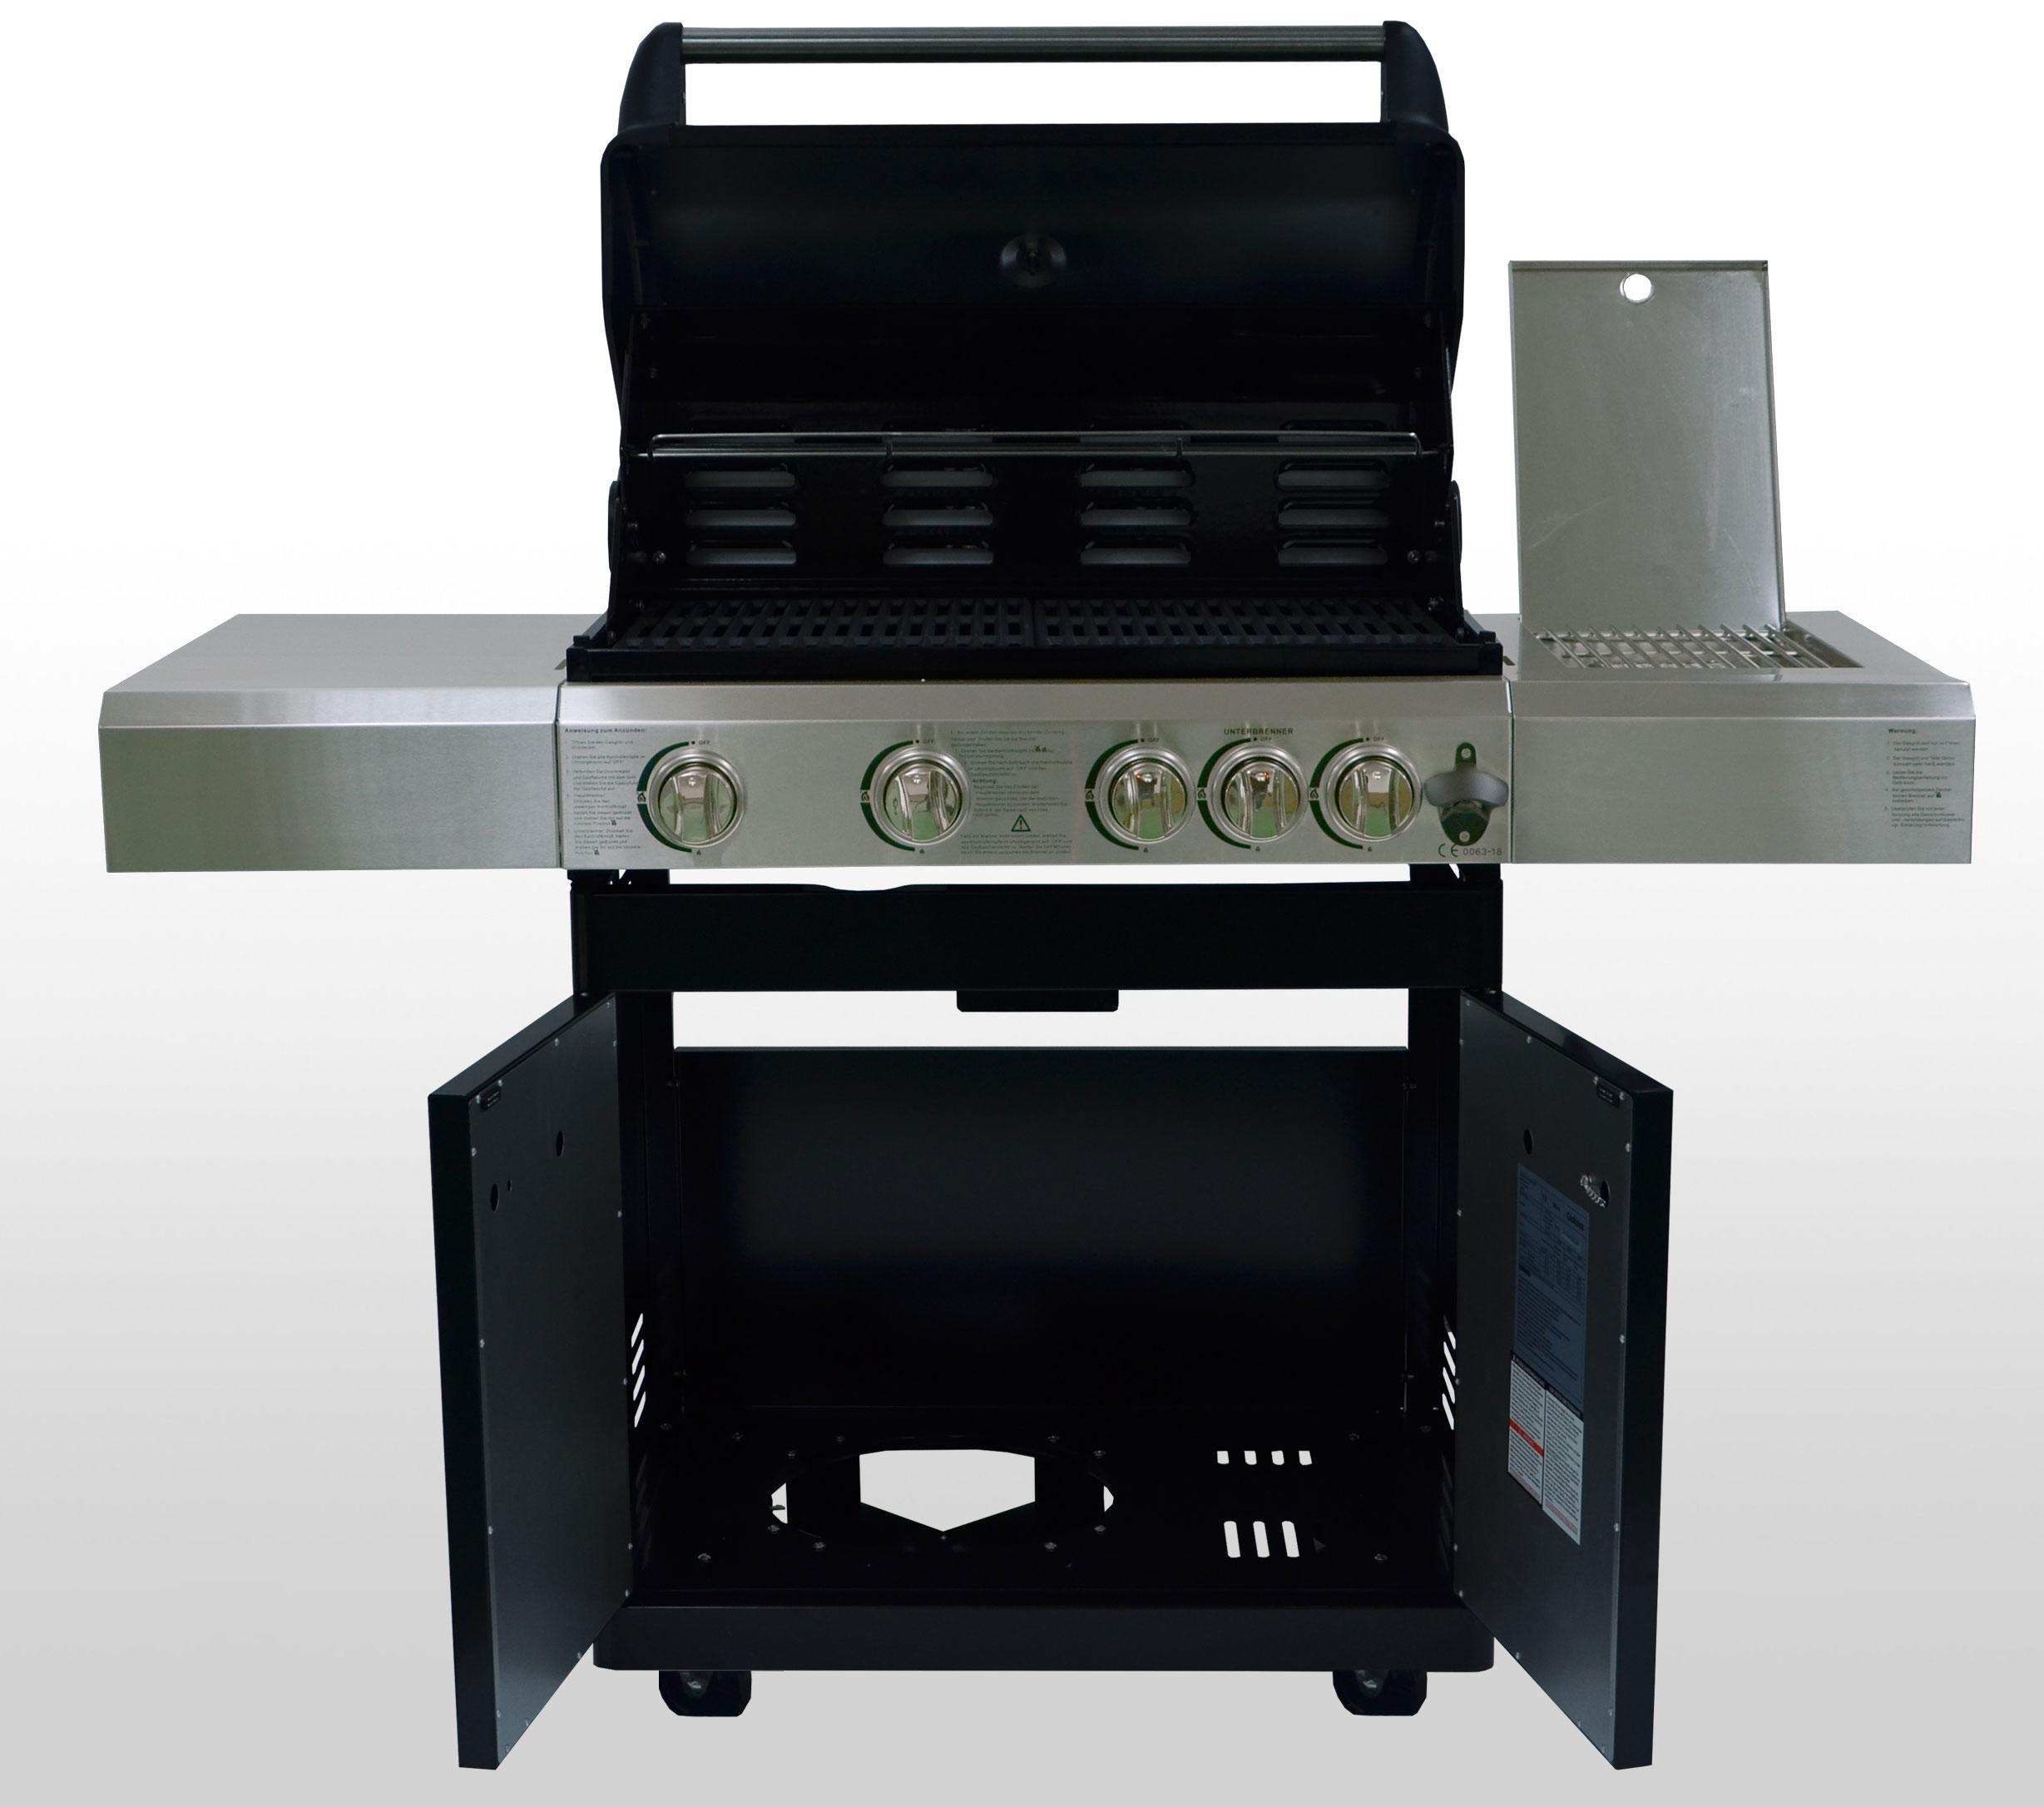 Gasgrill / Grillwagen BBQ Boss Columbia Heat Grillfläche 74x46cm Bild 2